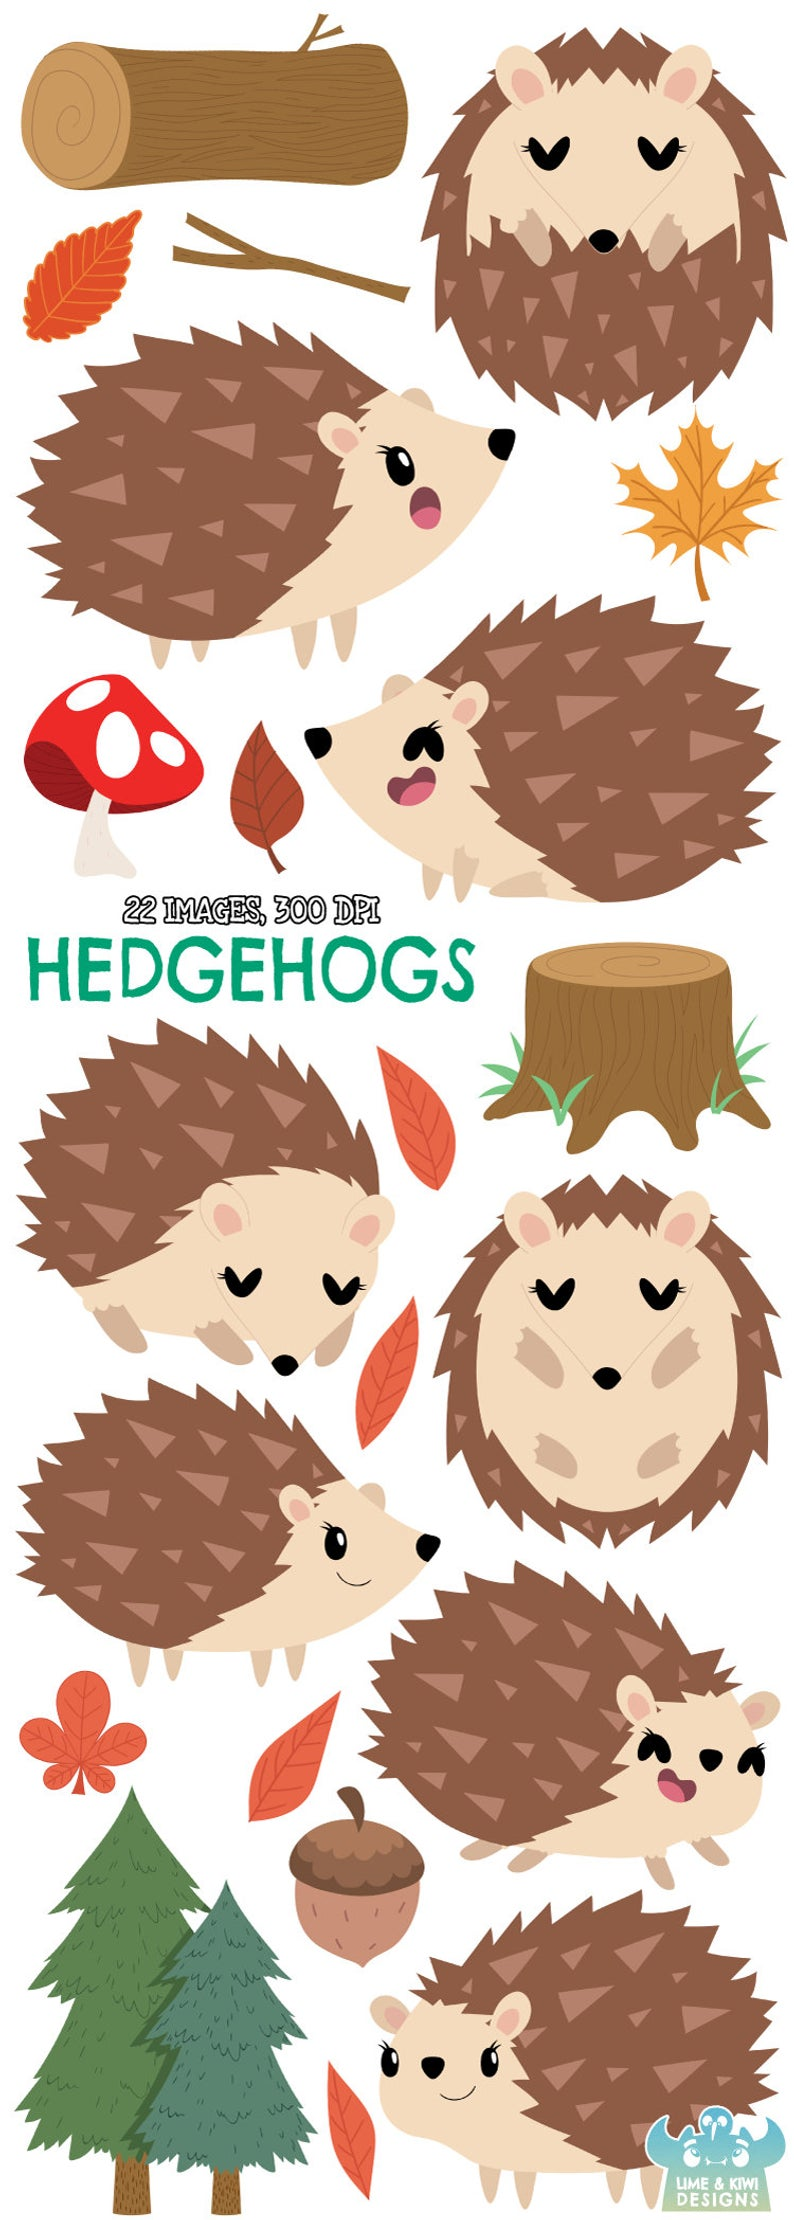 Hedgehogs Clipart, Instant Download Vector Art, Commercial